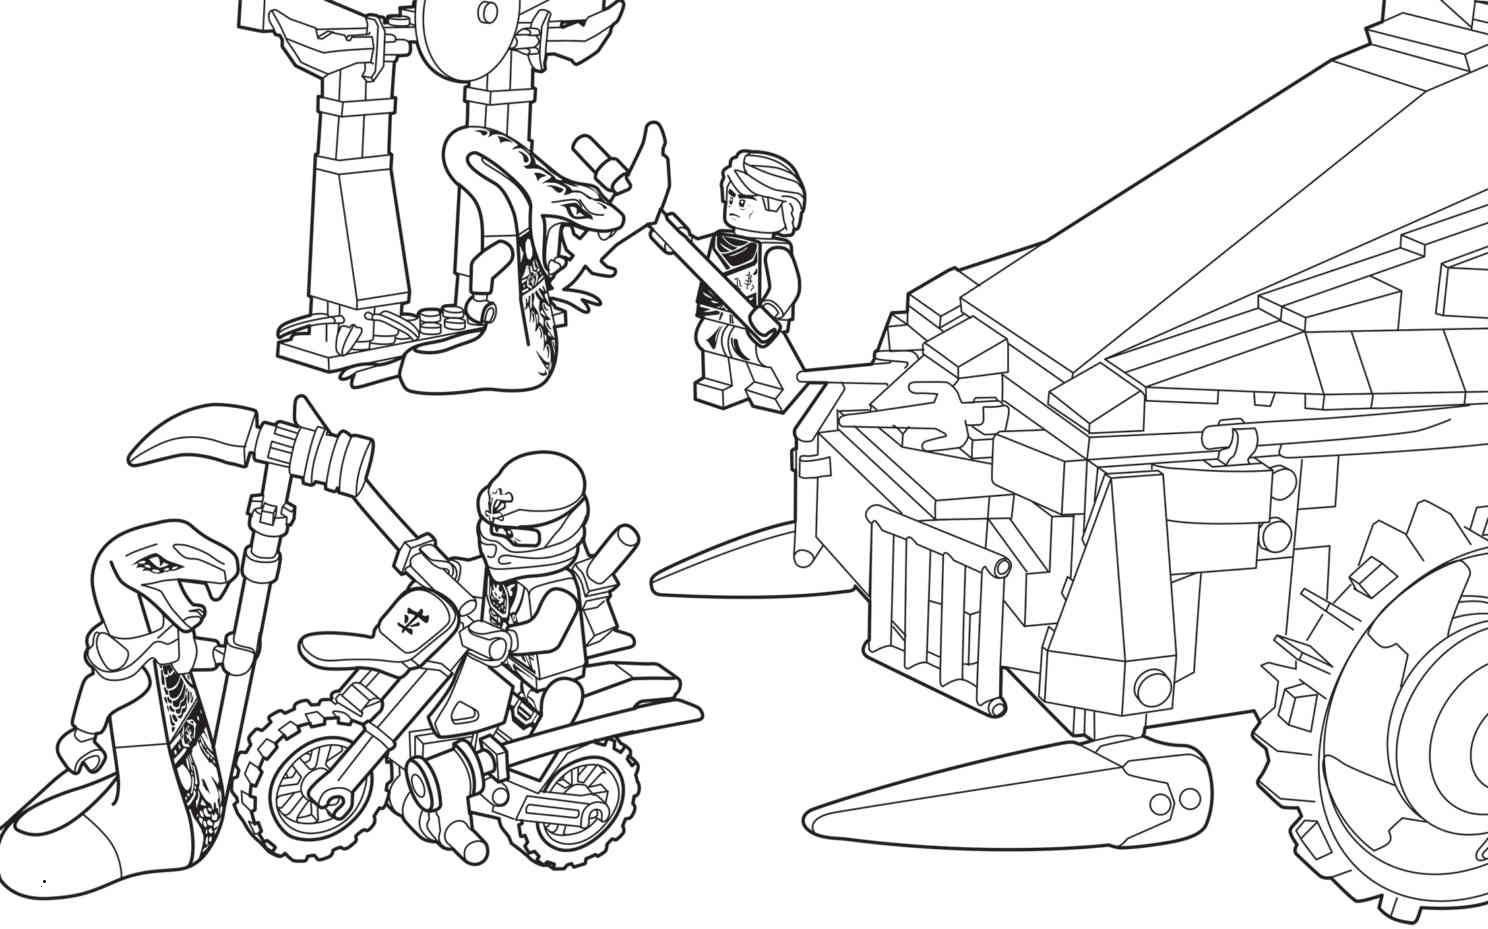 Ausmalbild Ninjago Lloyd Einzigartig 40 Inspiration Ninjago Goldener Ninja Ausmalbilder Treehouse Nyc Das Bild